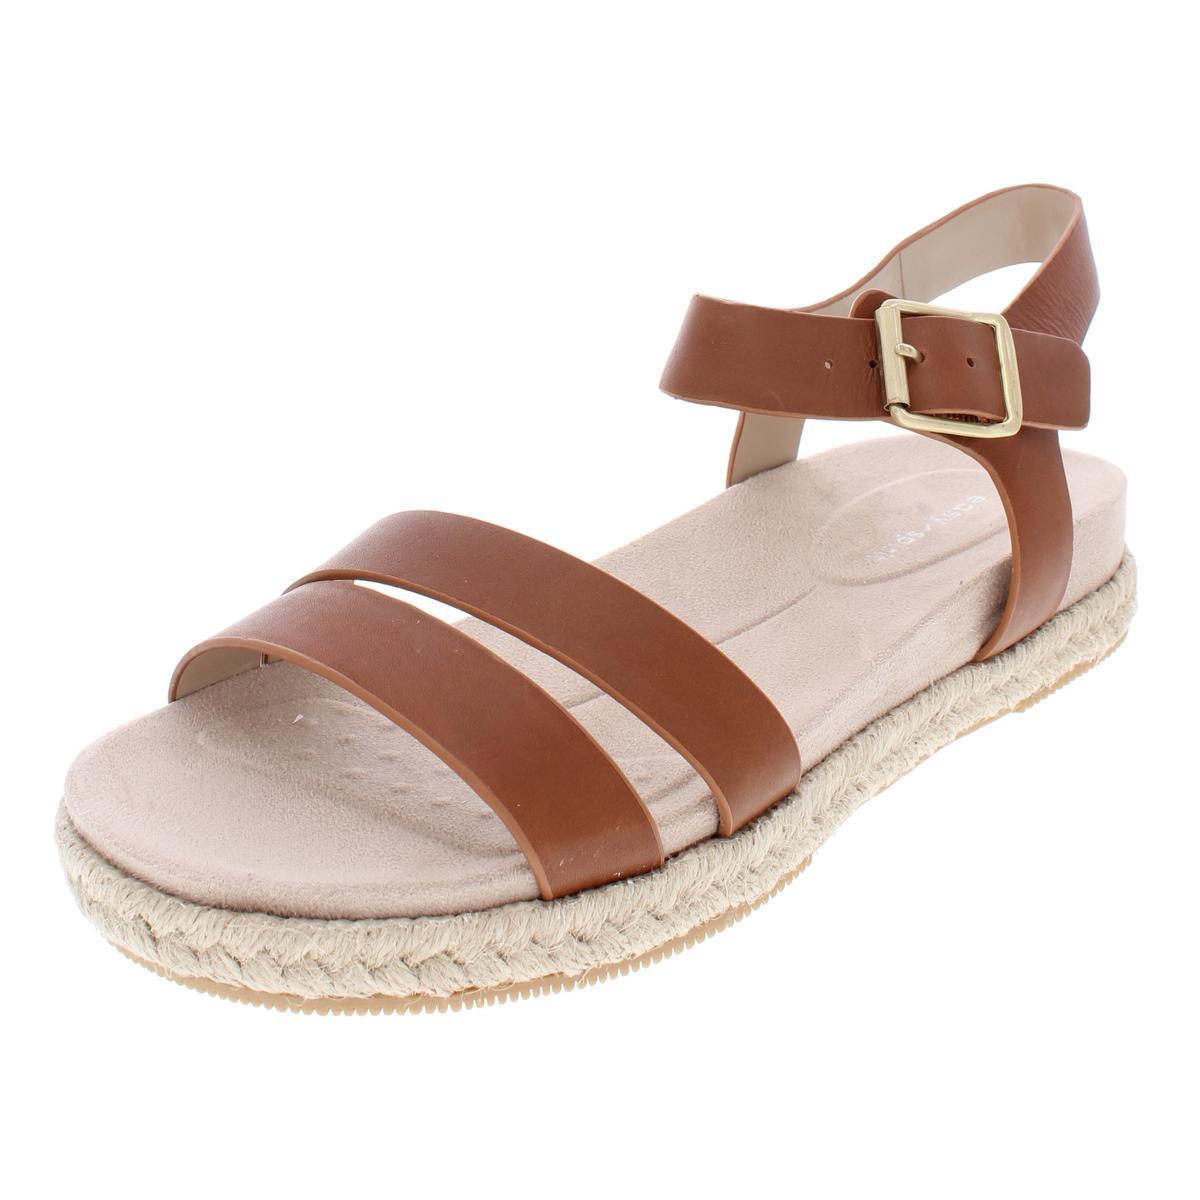 ab30a3836126 Details about Easy Spirit Womens Ixia Solid Leather Platform Espadrilles  Sandals BHFO 4555